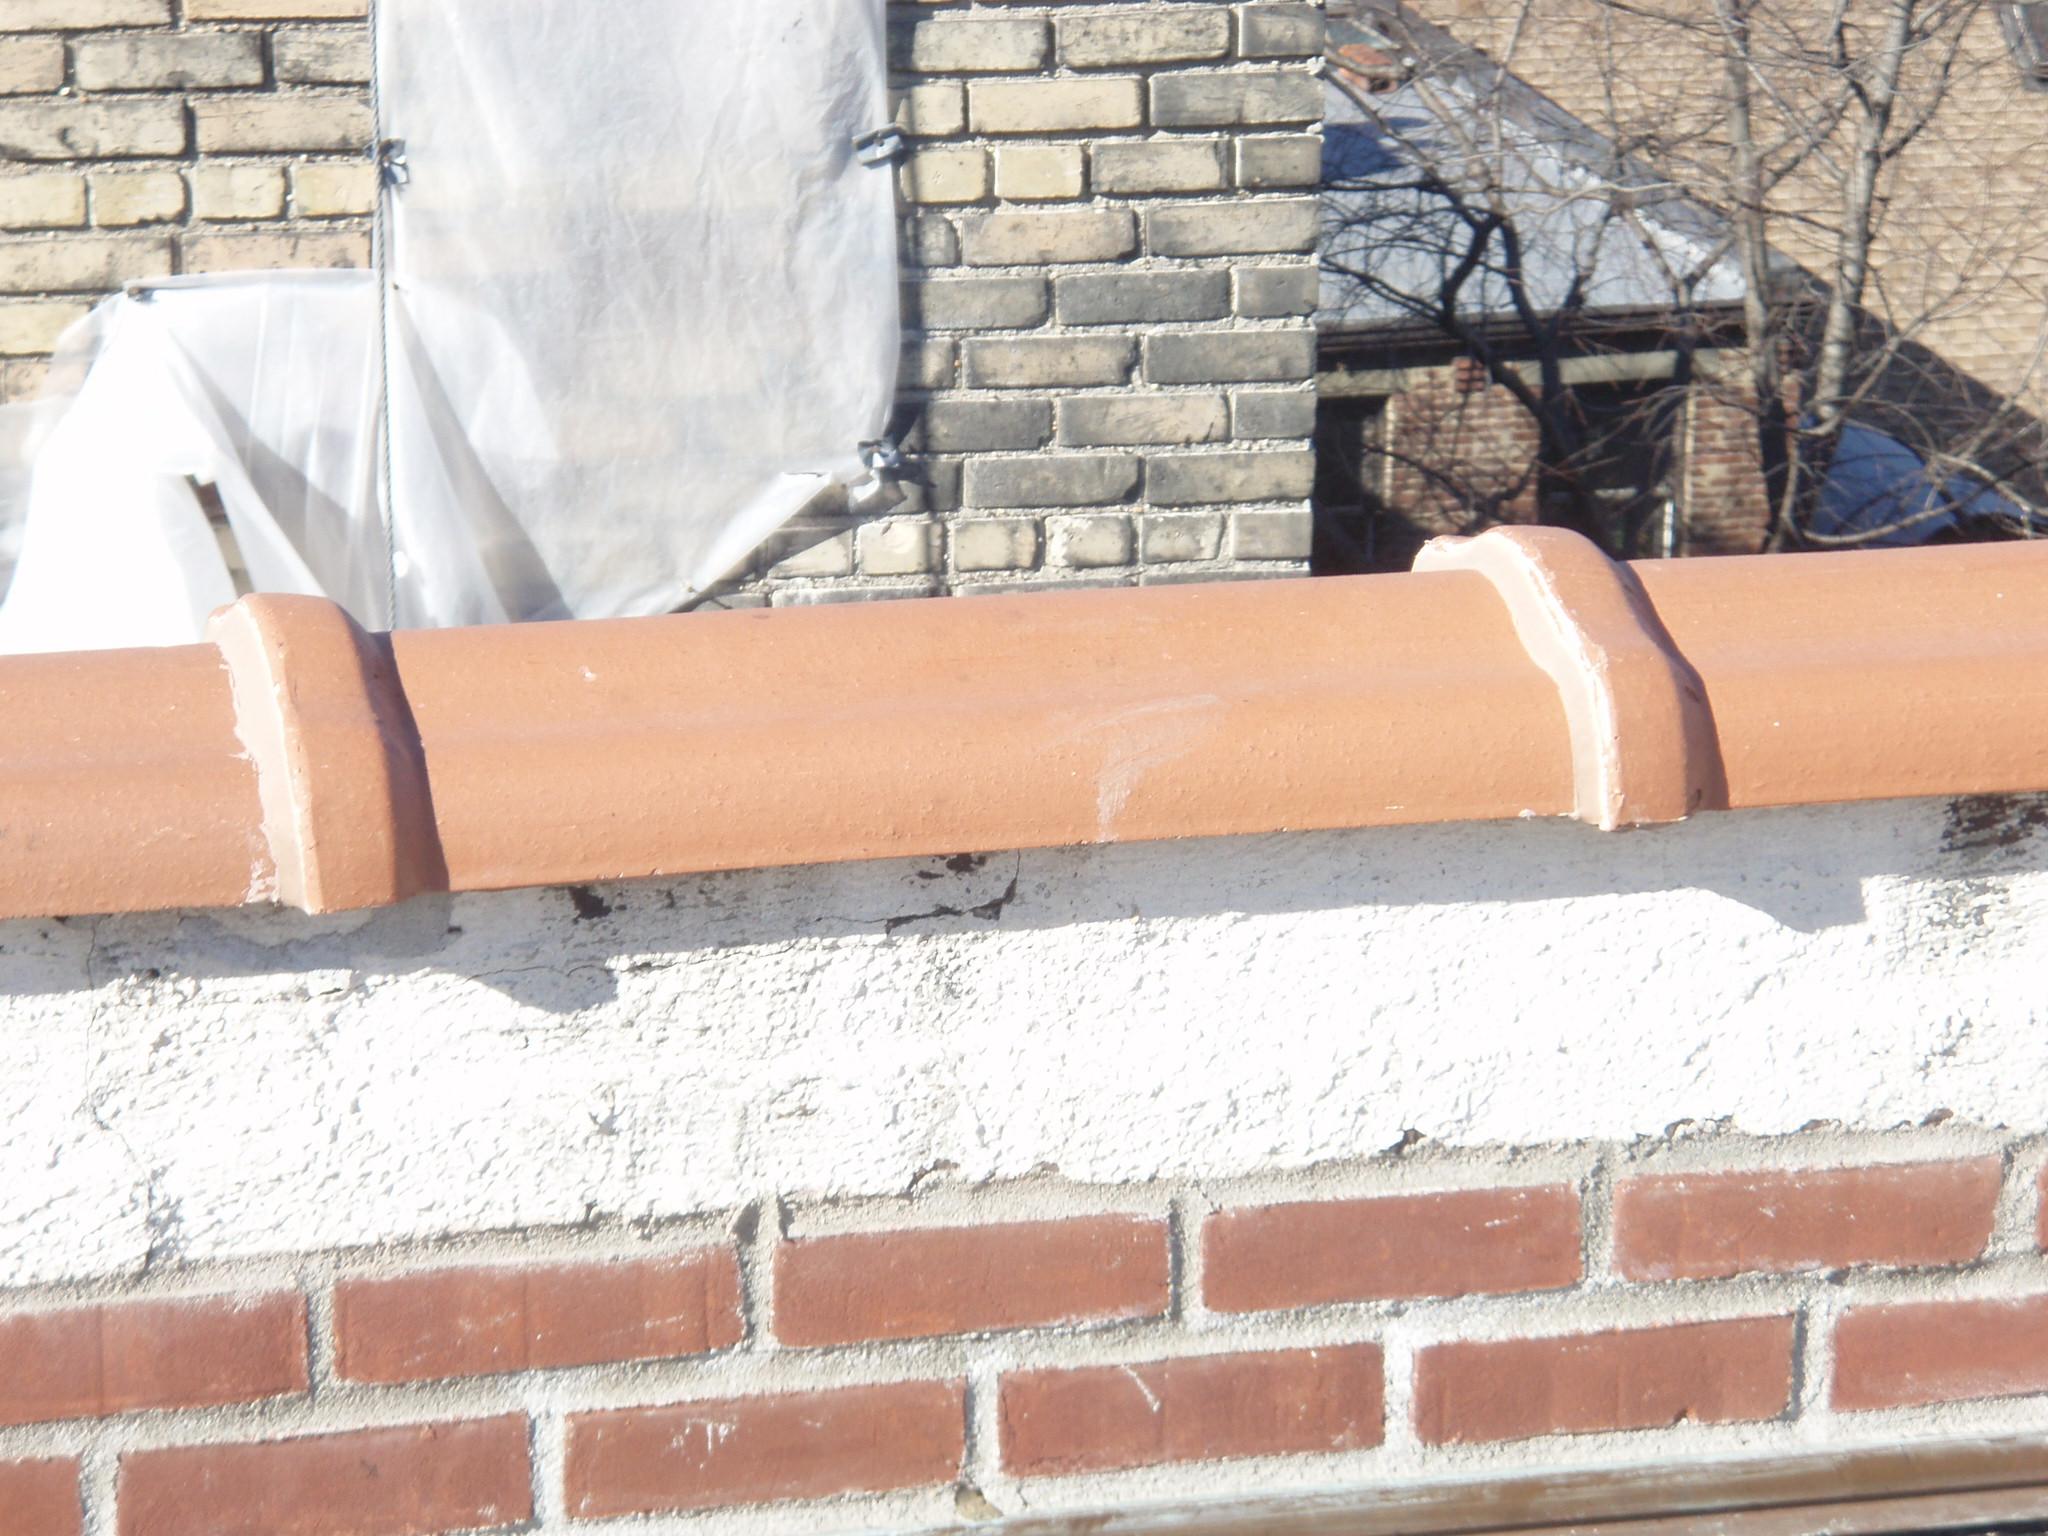 Brooklyn-Heights-parapet-repair-completed-LFA Architects.JPG